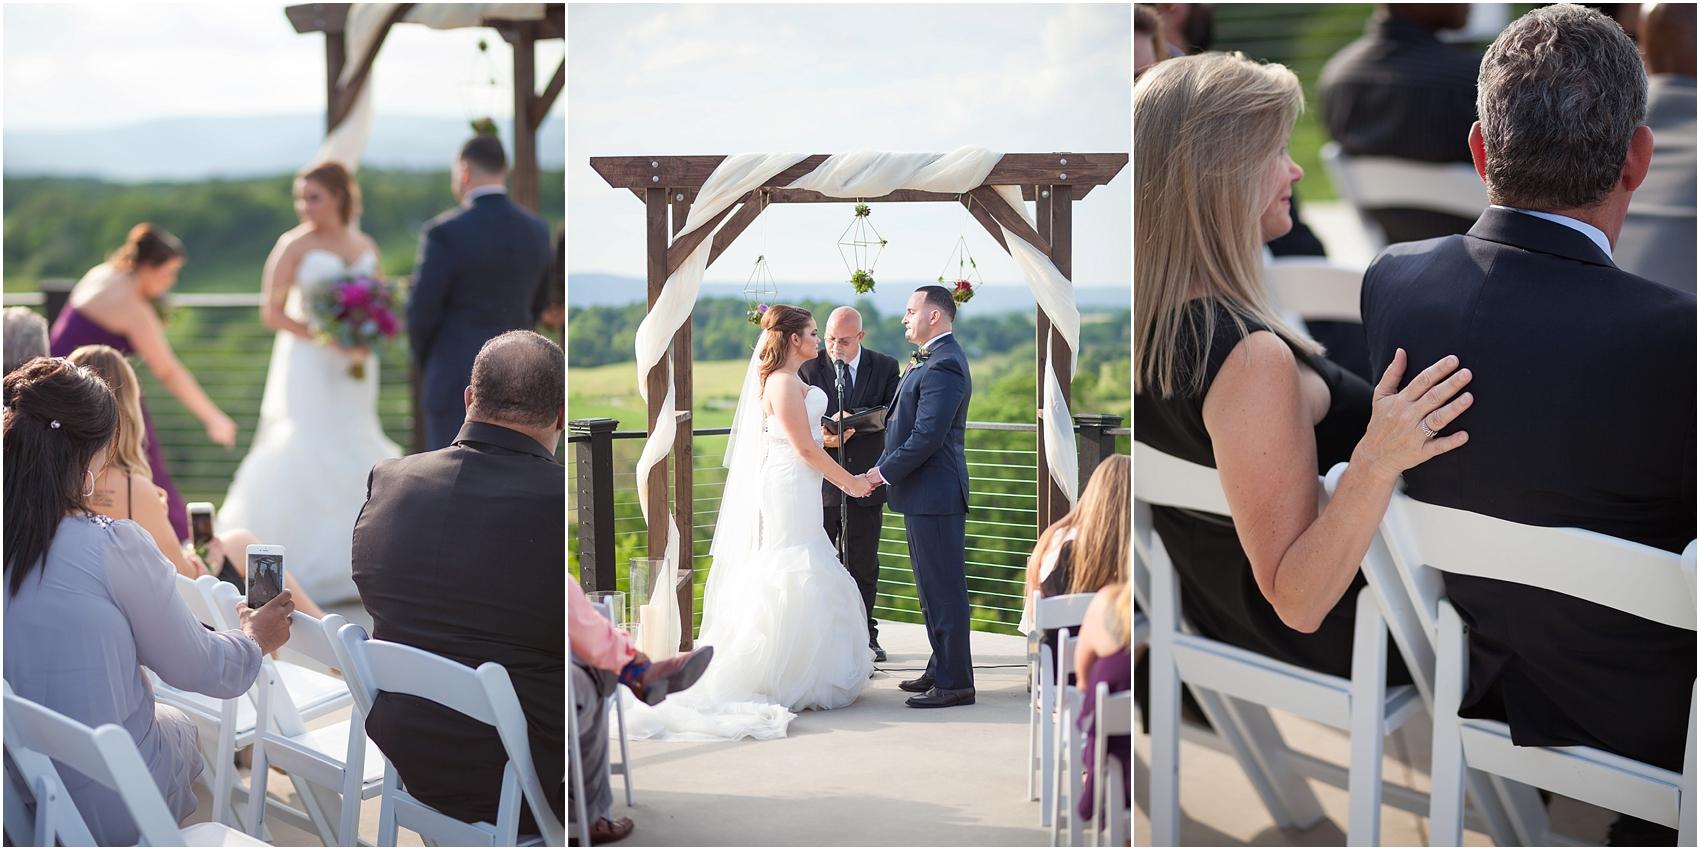 Blue Valley Winery Wedding Feather n Oak Photography_0019.jpg